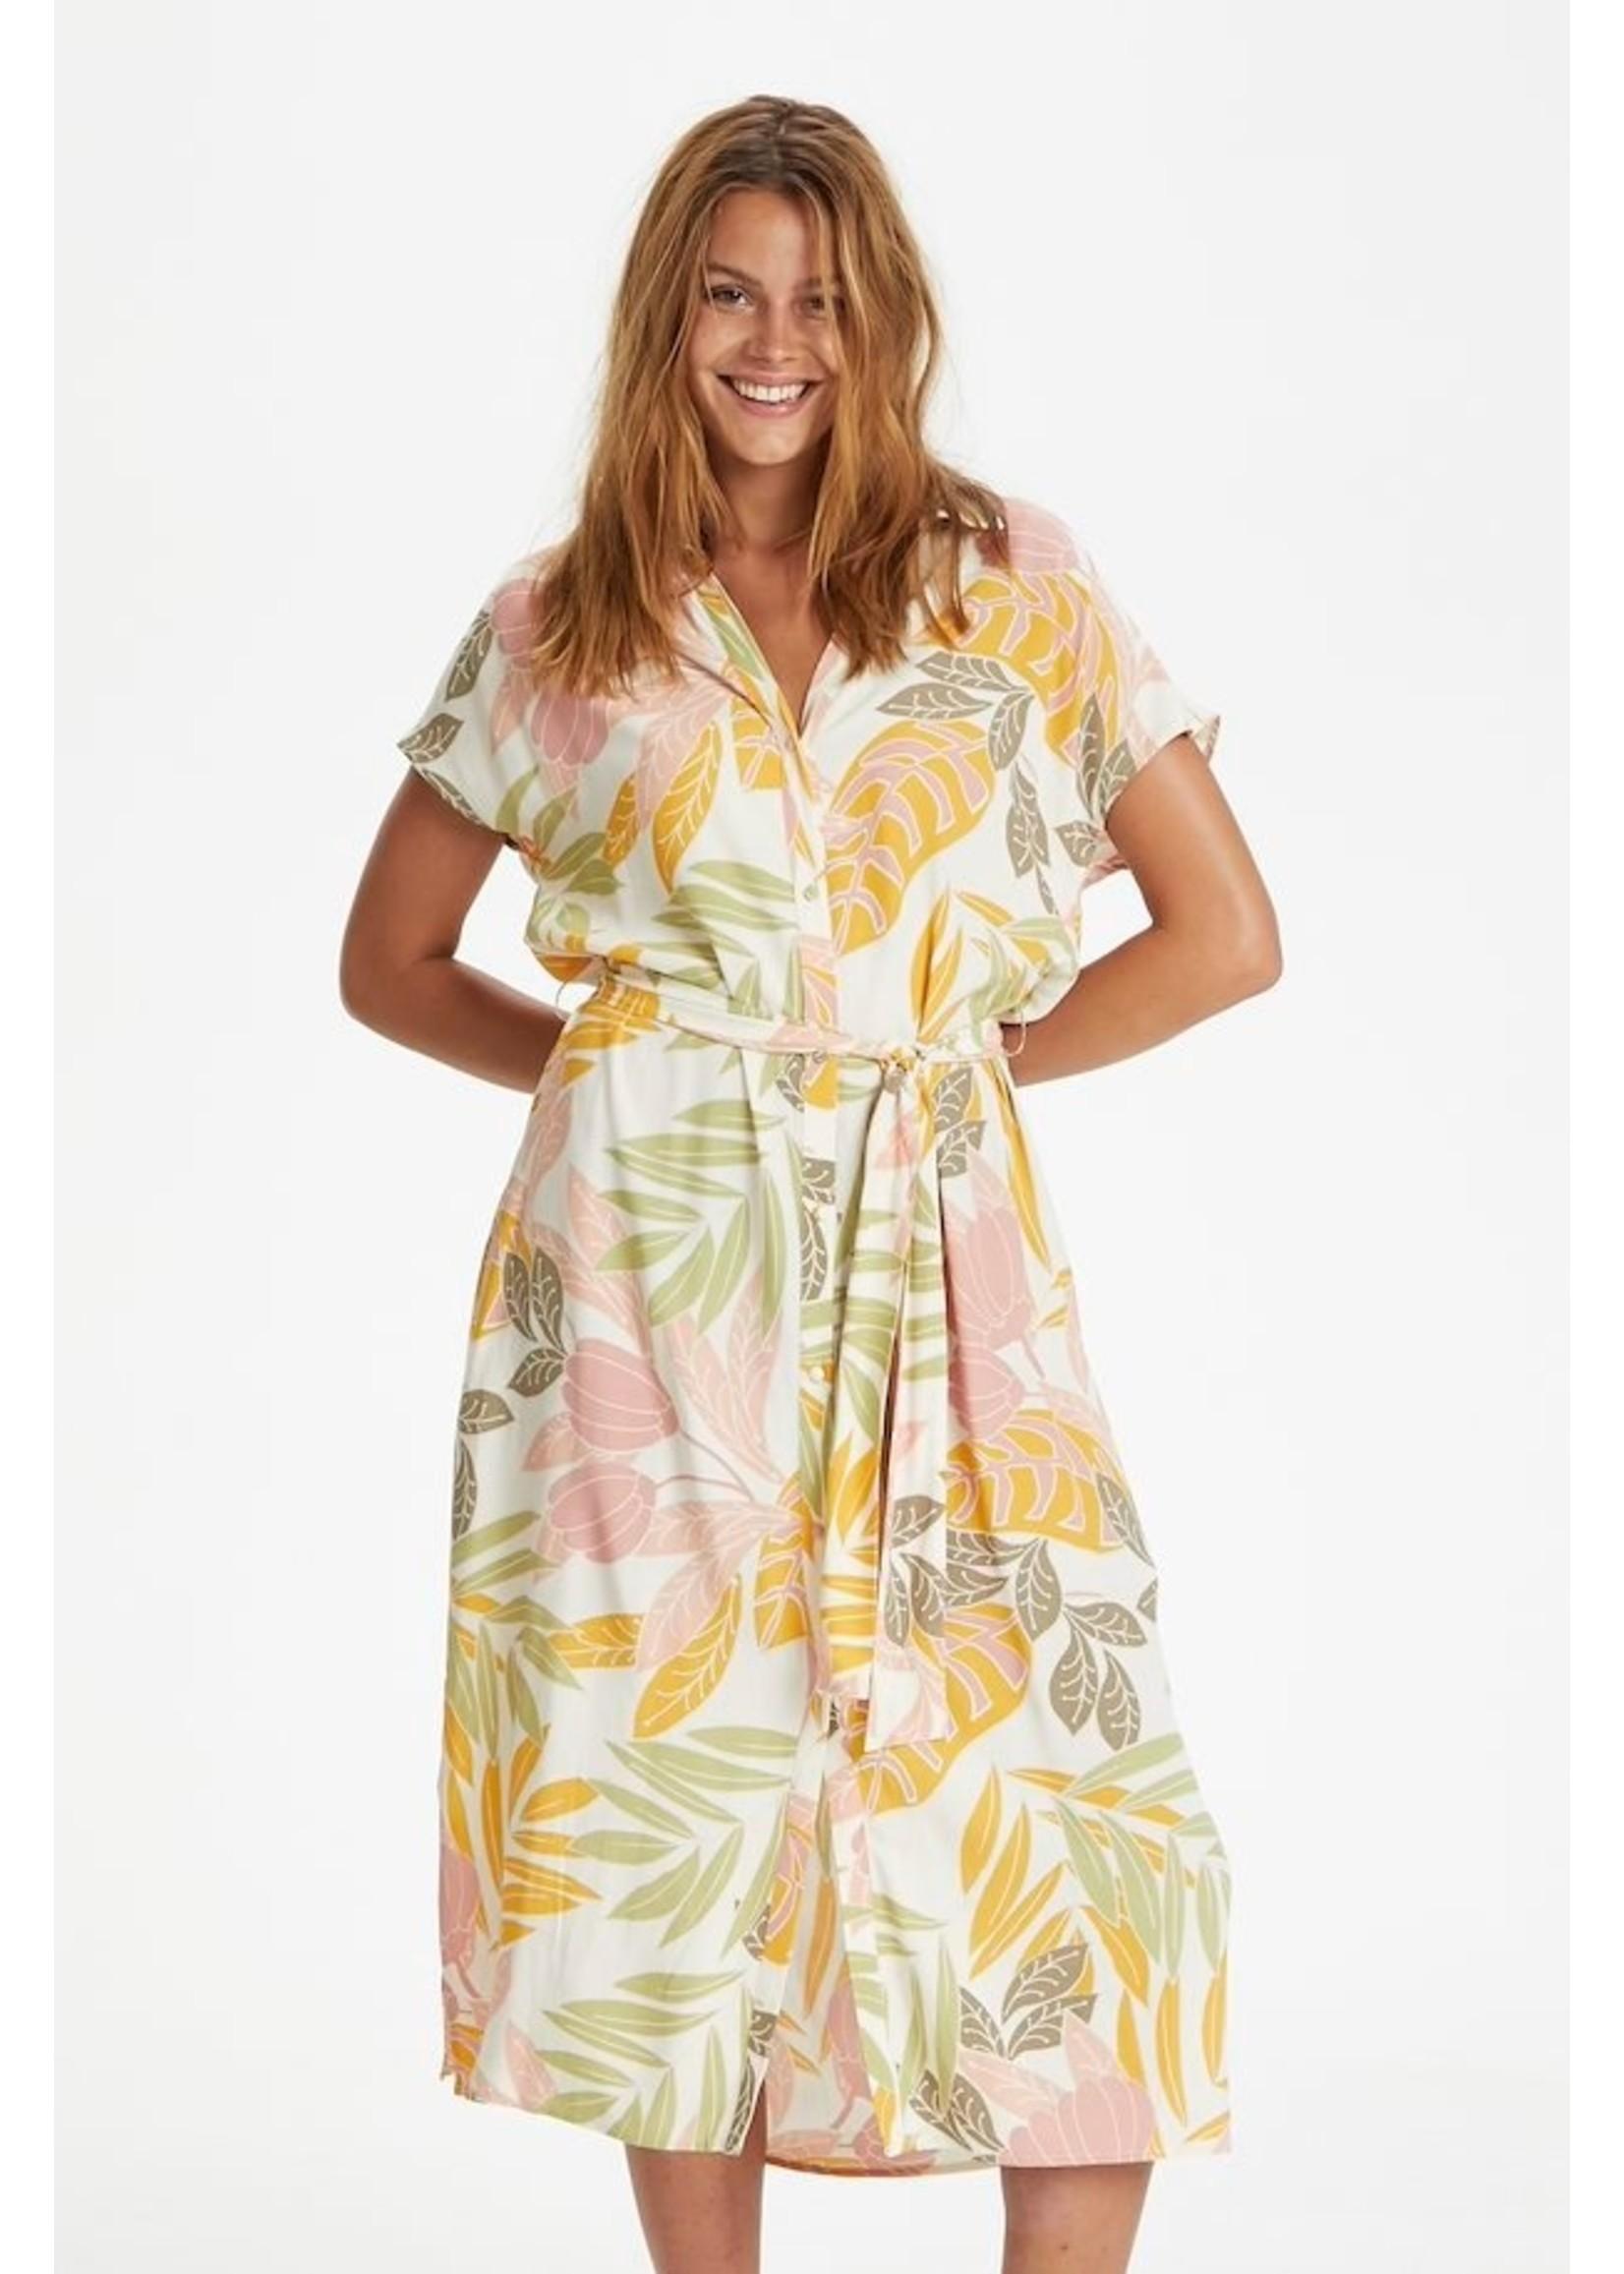 Saint Tropez Dress-light woven GabySZ  Dress